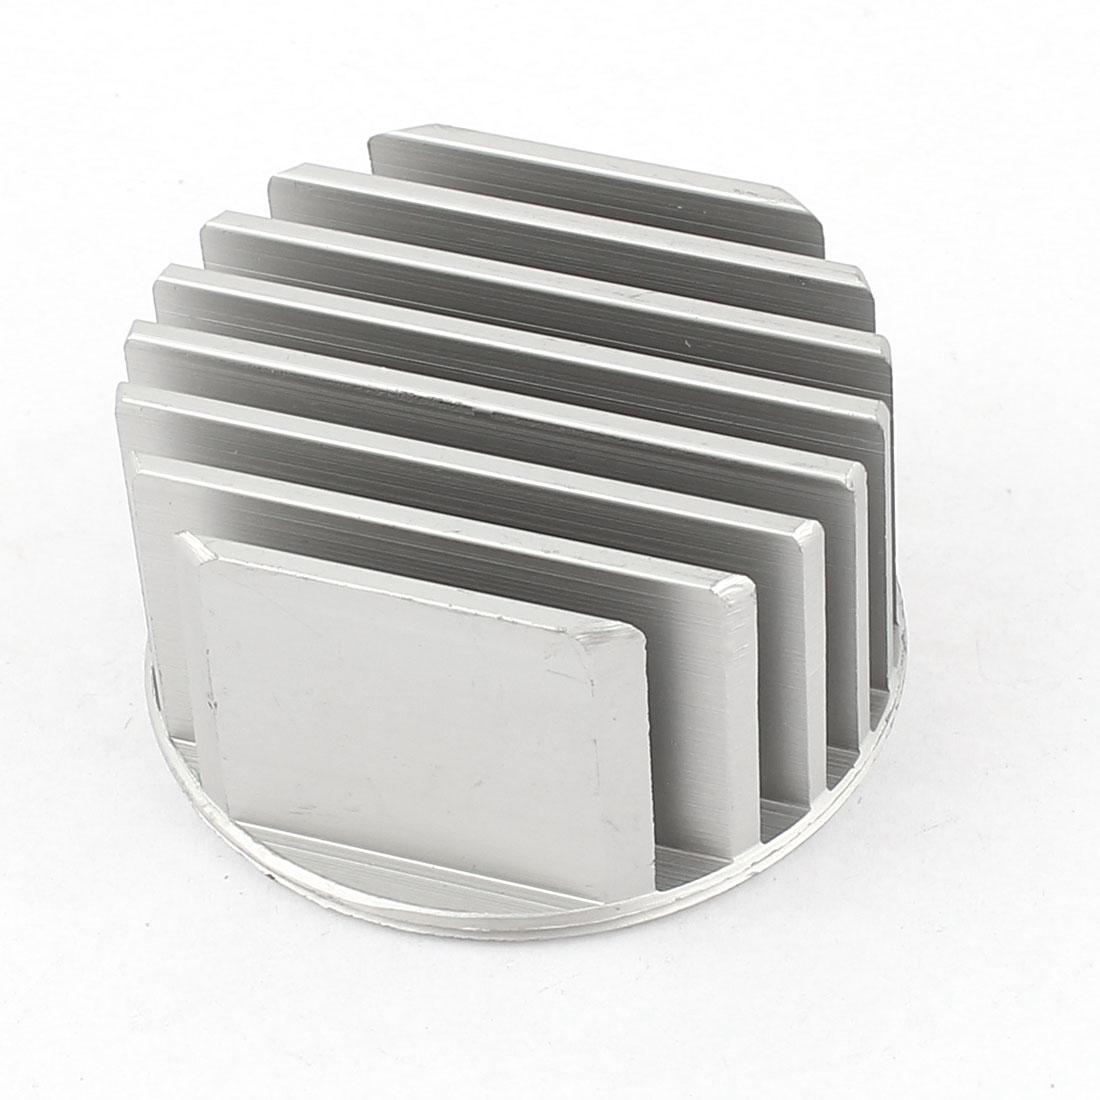 52mm x 30mm Cylinder 5W High Power LED Heatsink Aluminium Cooling Fin